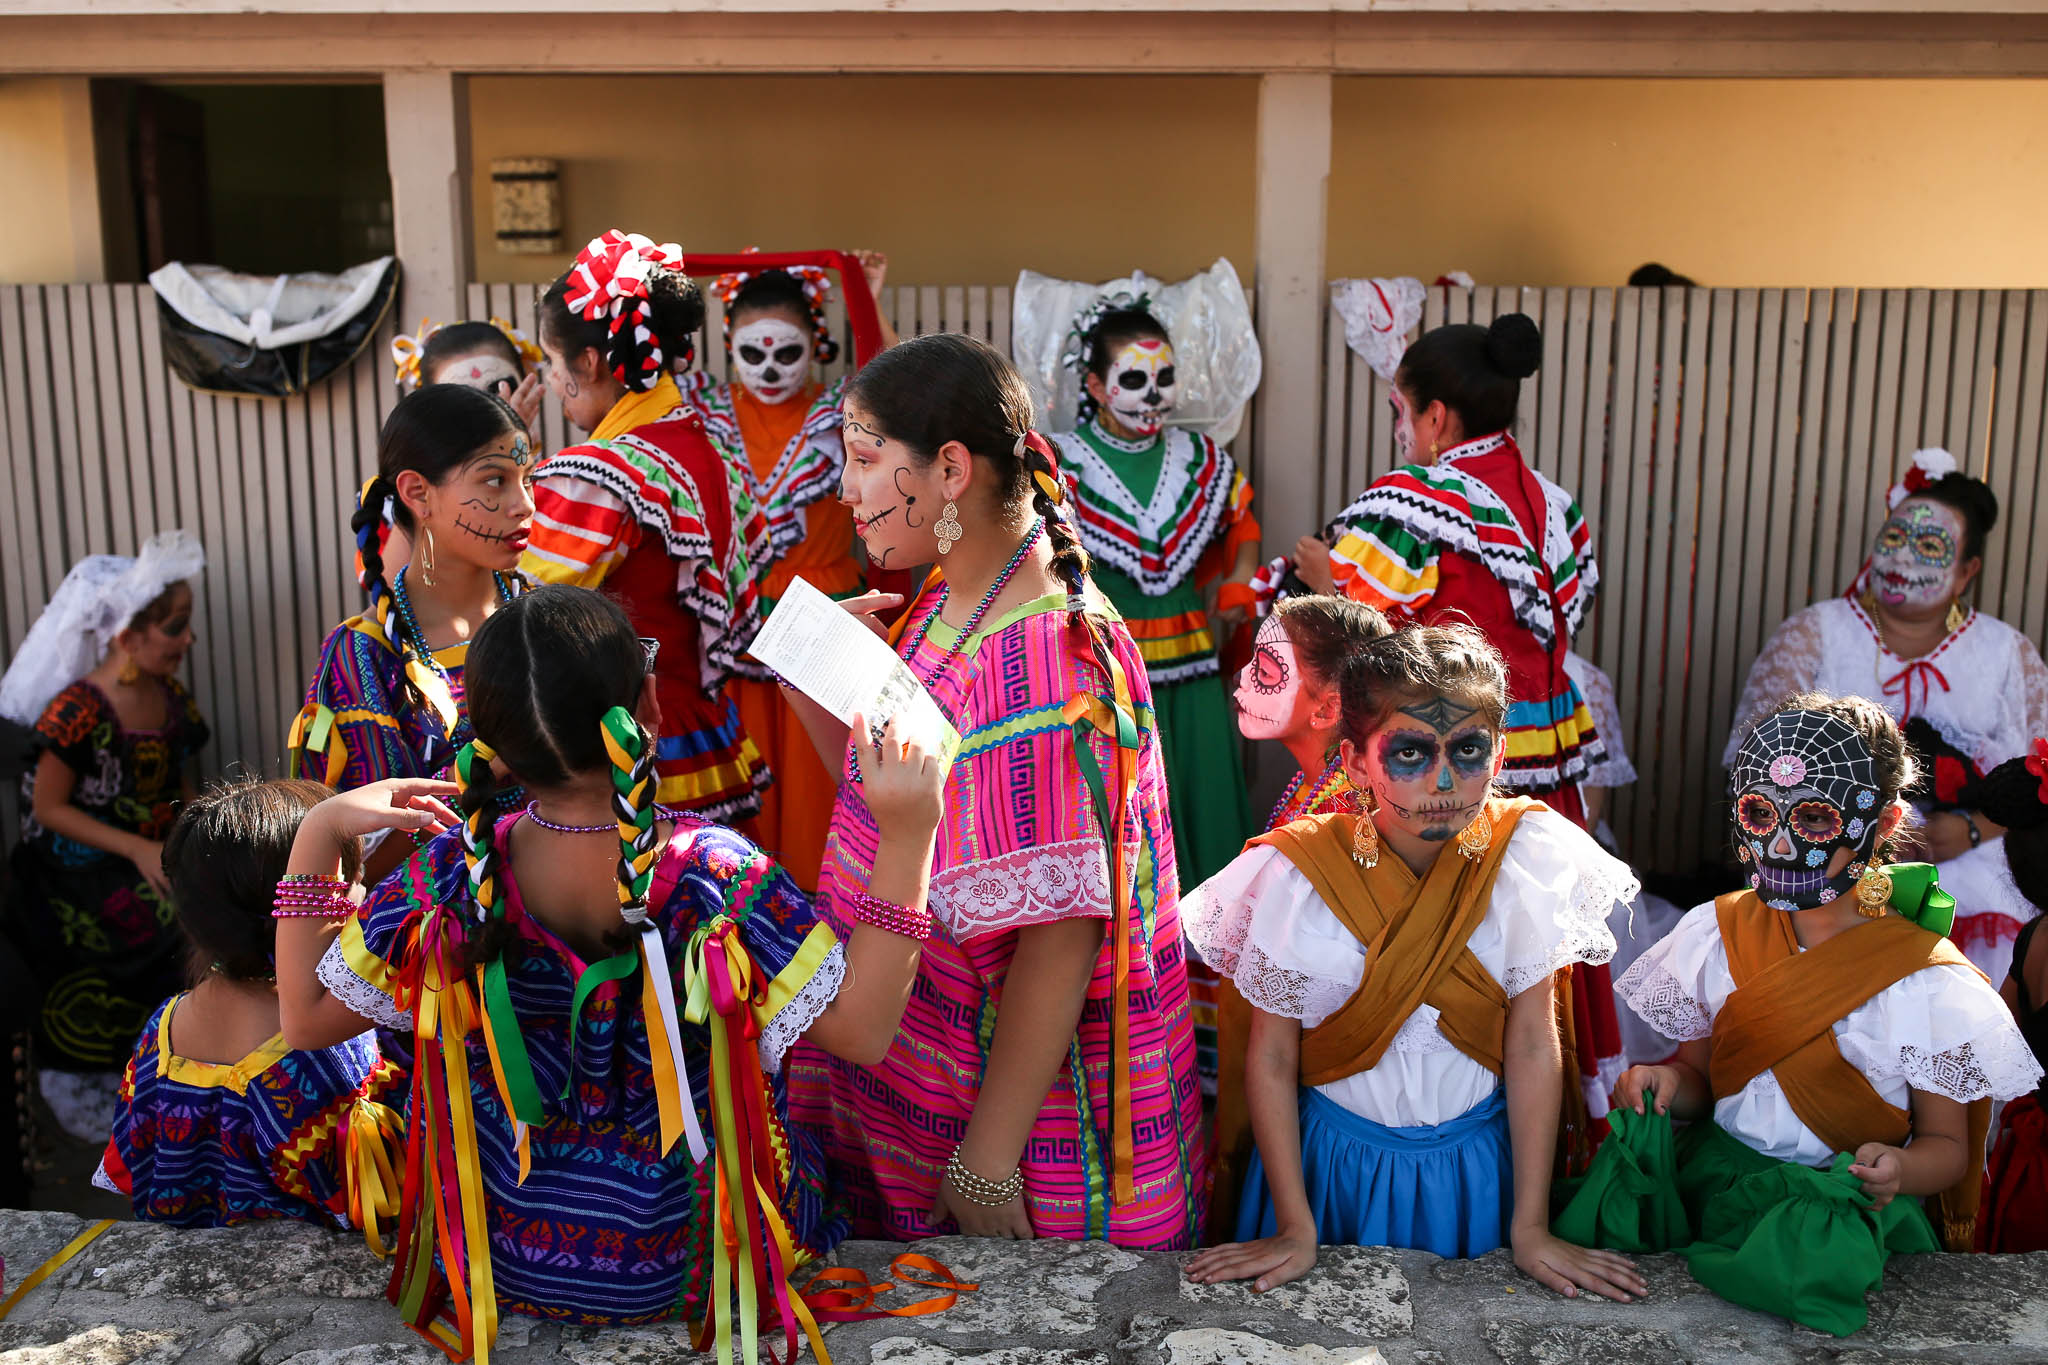 Performers prepare to go on stage at La Villita.